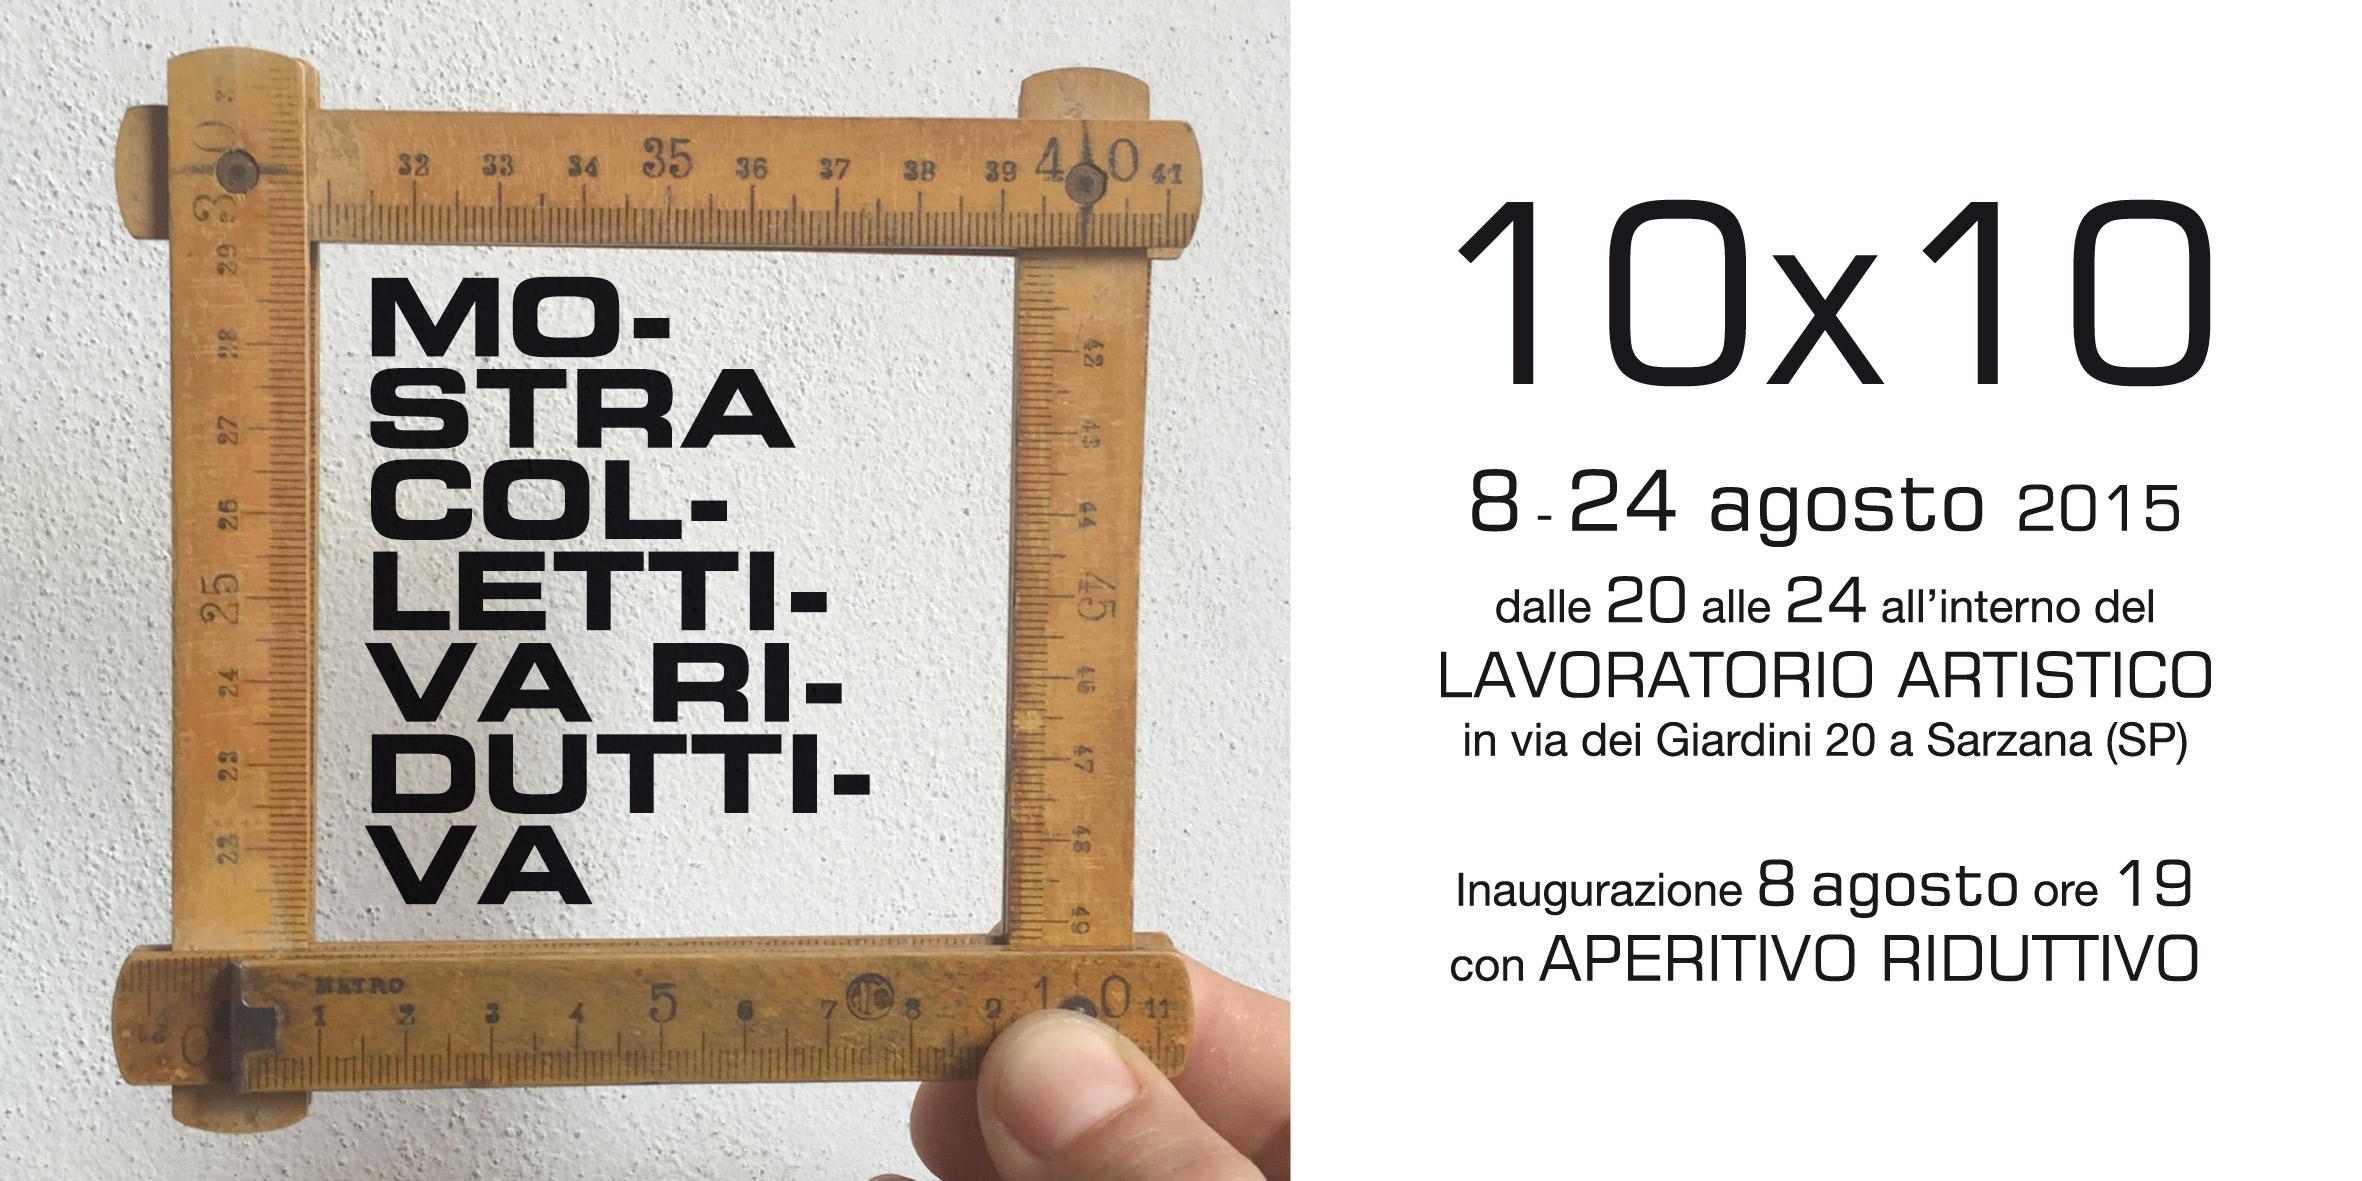 cartoline mostra 10x10